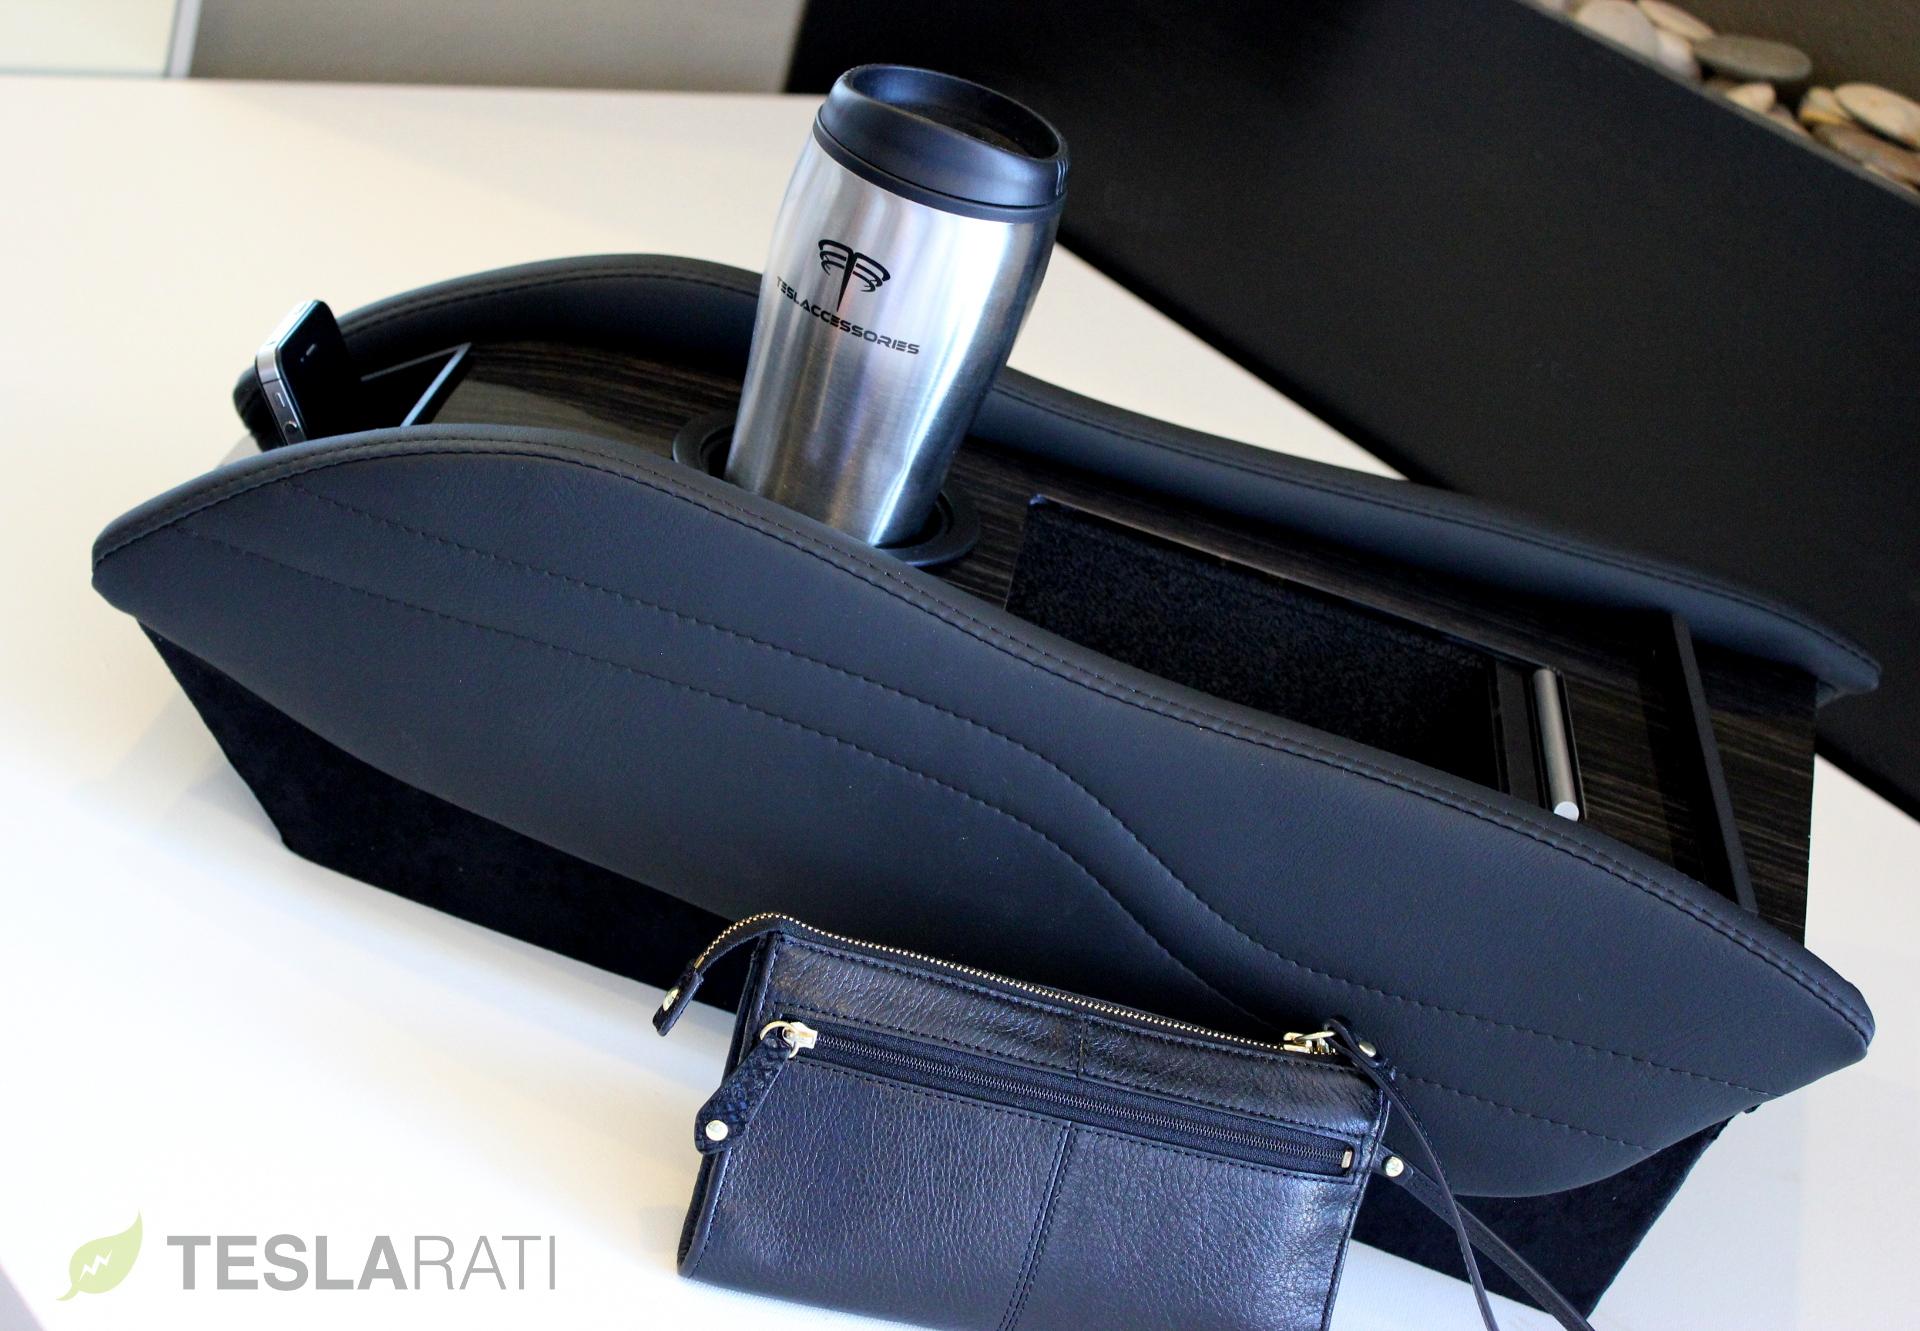 Tesla Model S Center Console Insert (CCI)